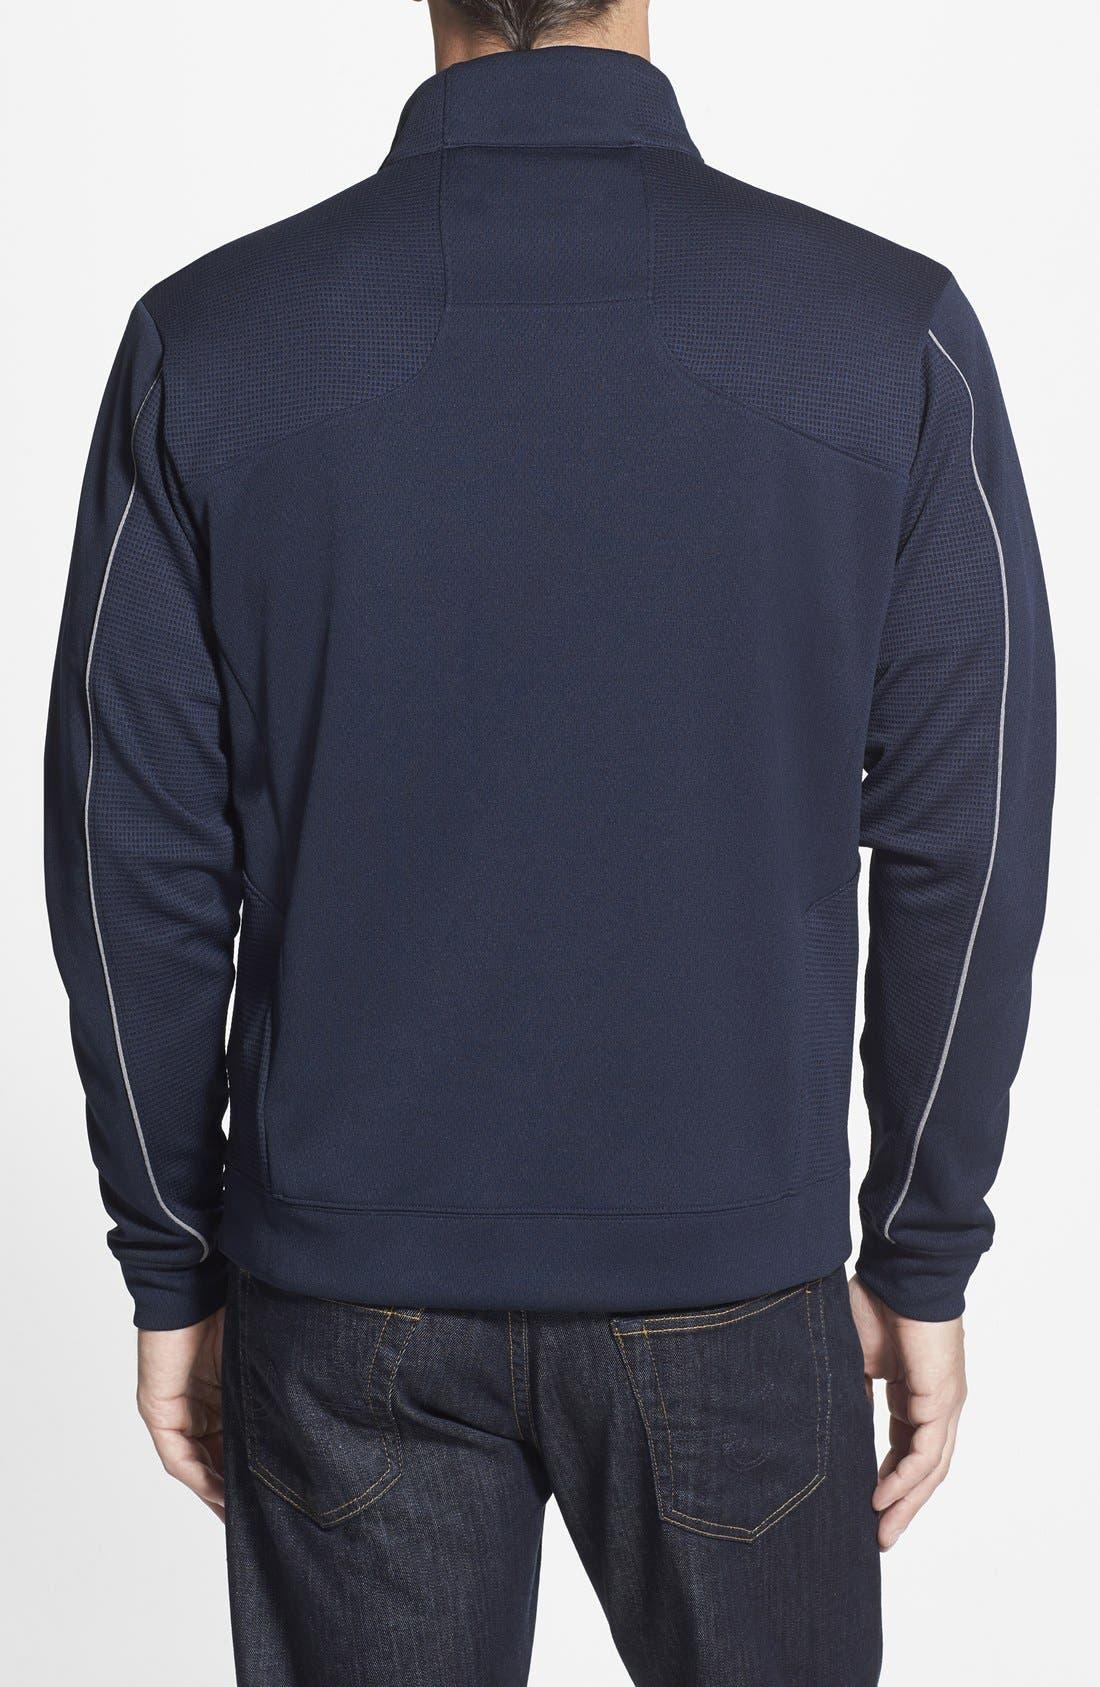 Seattle Seahawks - Edge DryTec Moisture Wicking Half Zip Pullover,                             Alternate thumbnail 3, color,